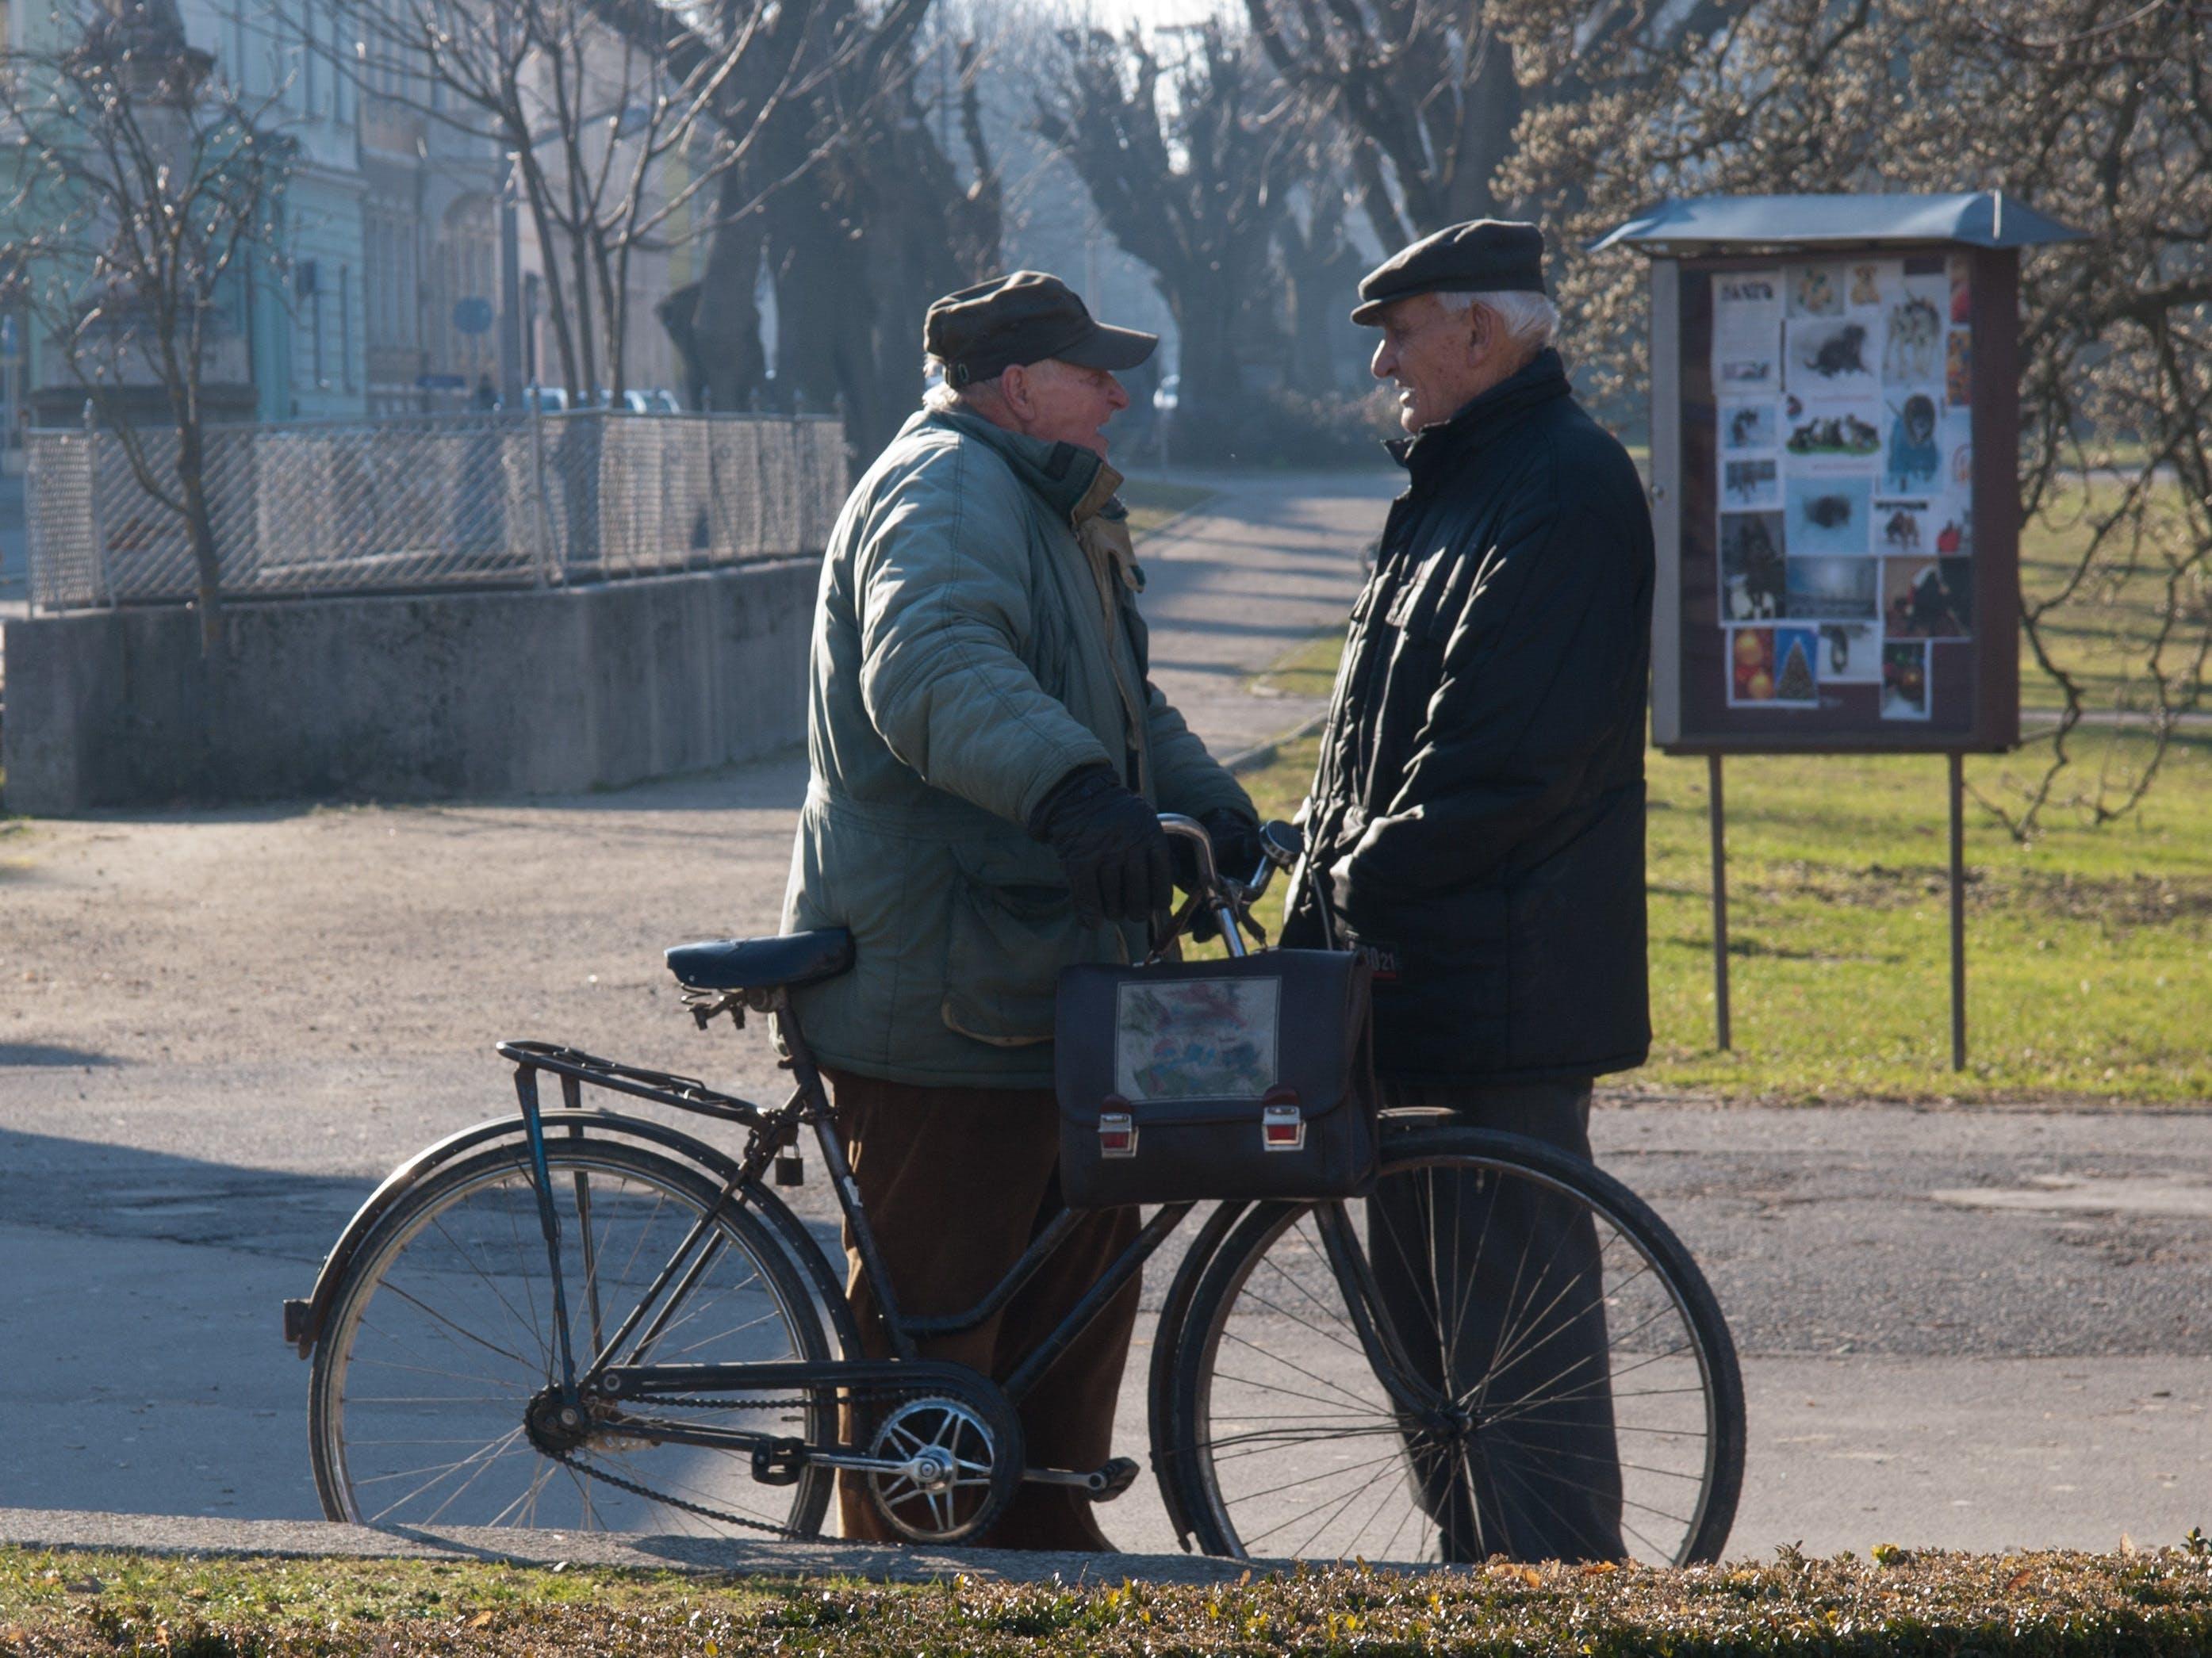 Free stock photo of people, men, standing, bike